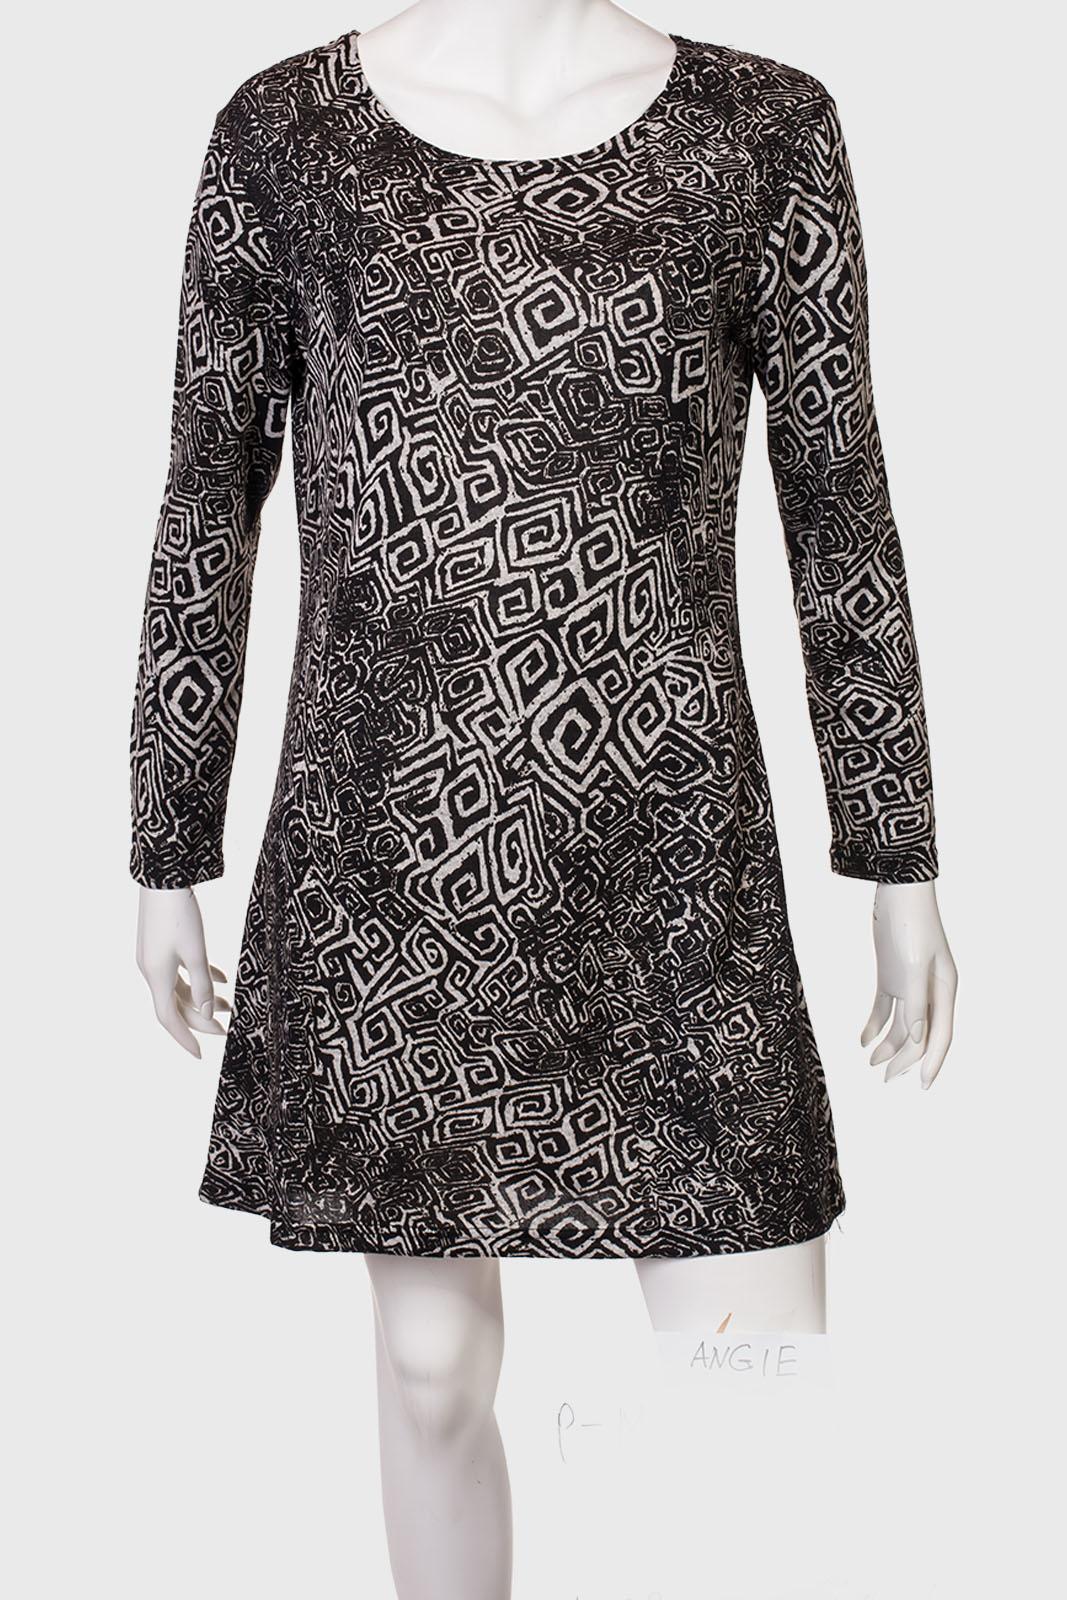 Брендовое короткое платье ANGIE.